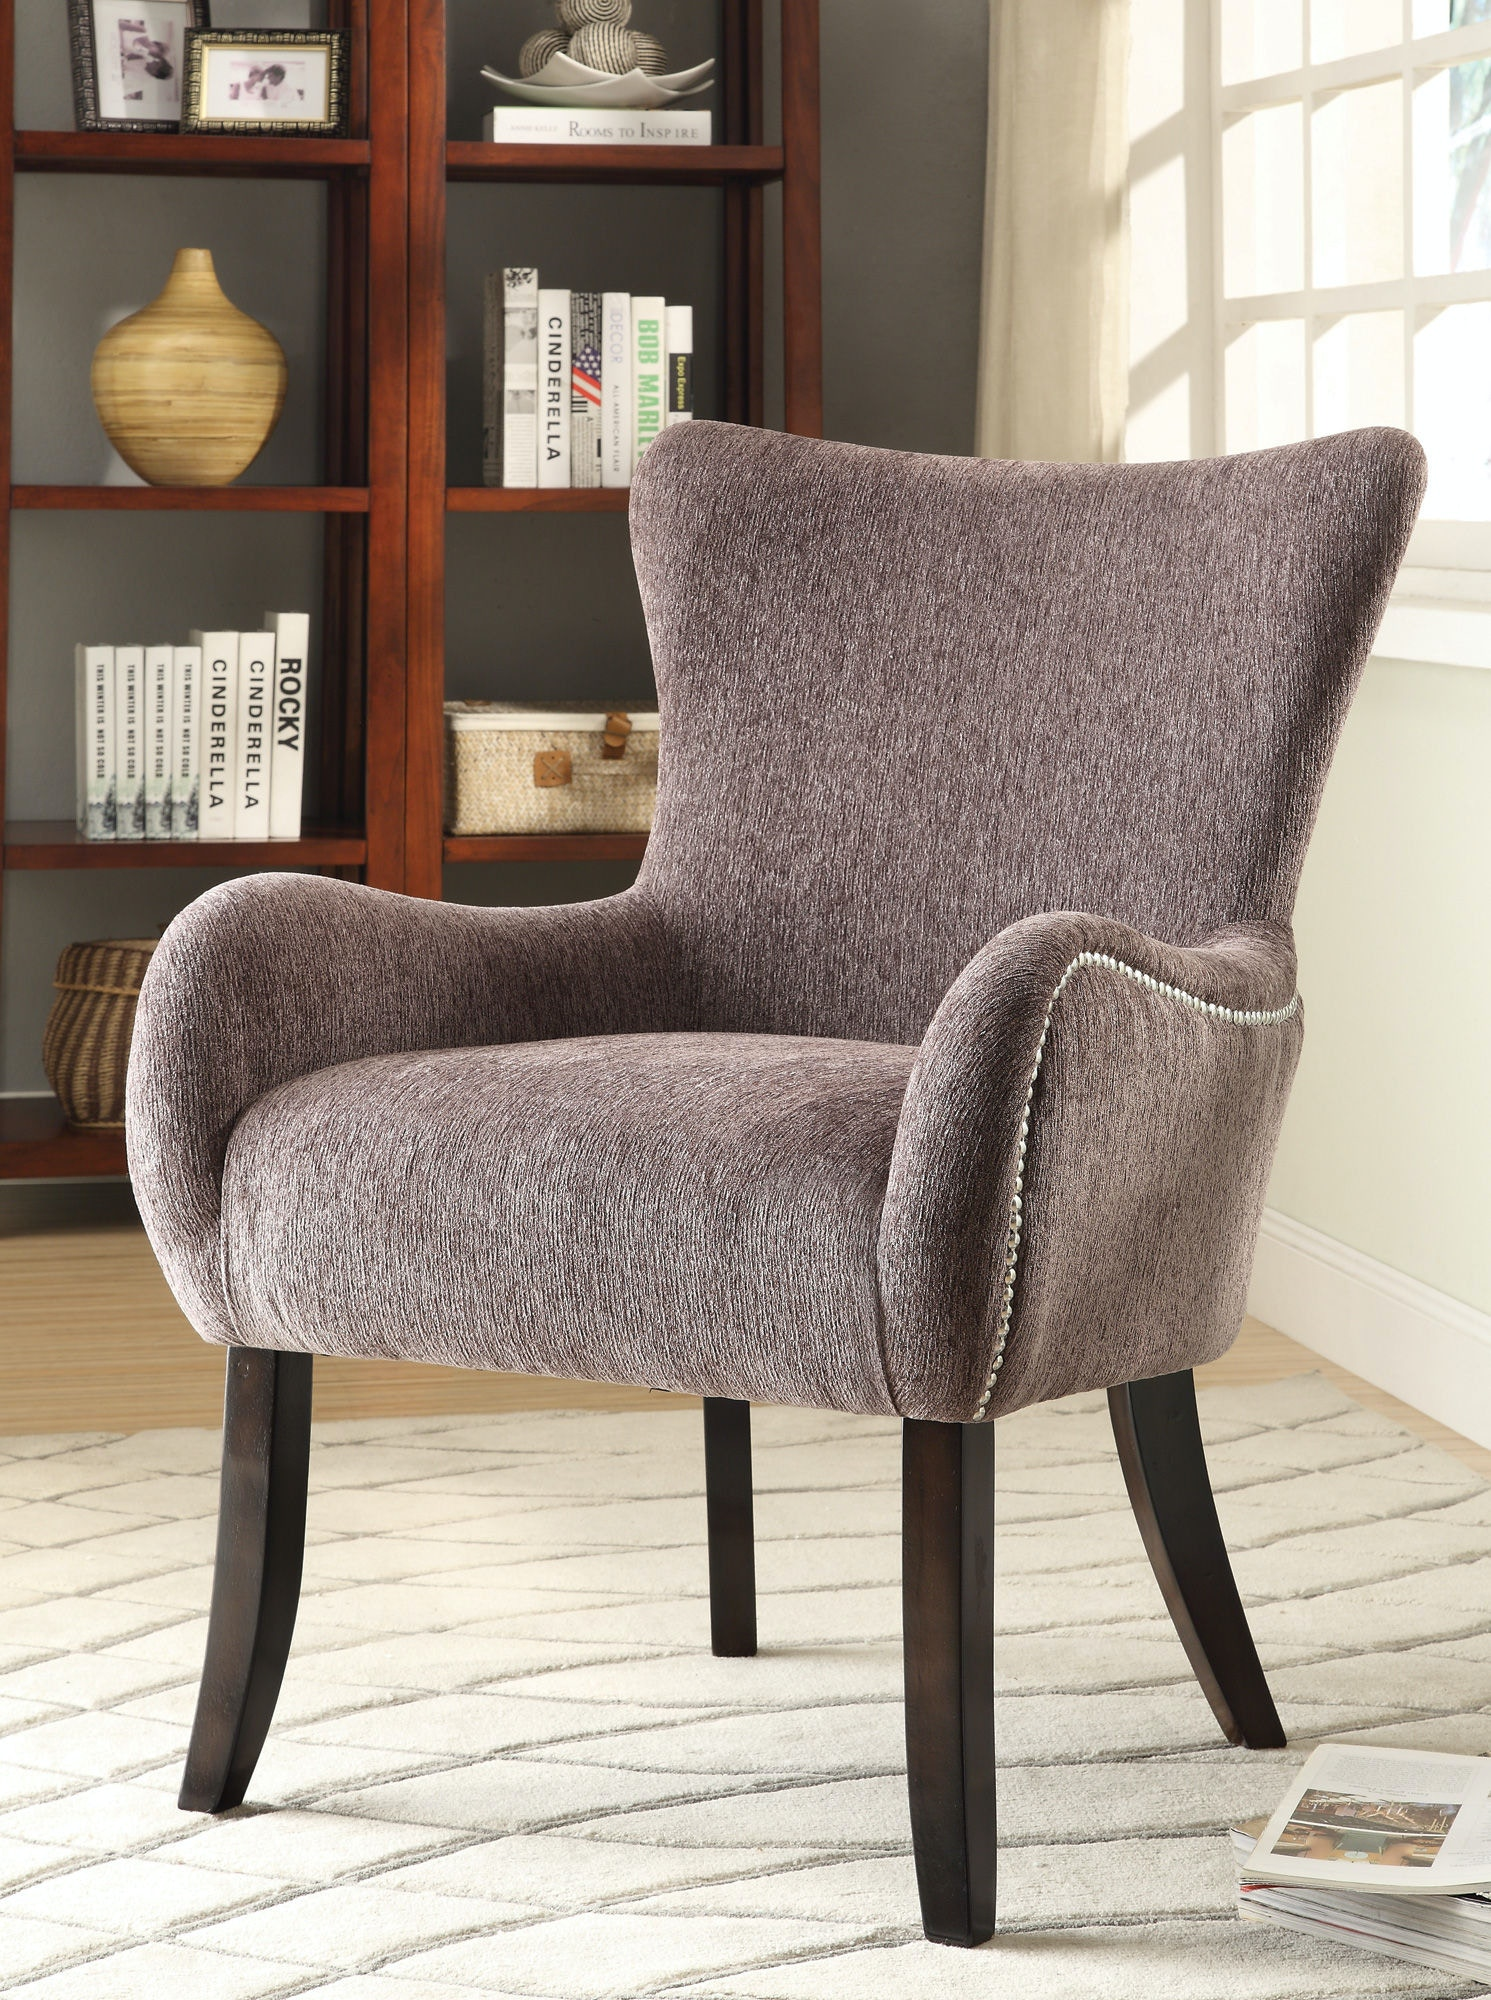 coaster living room accent chair 902504 home decor riverside bedroom 6 drawer dresser 84562 home decor